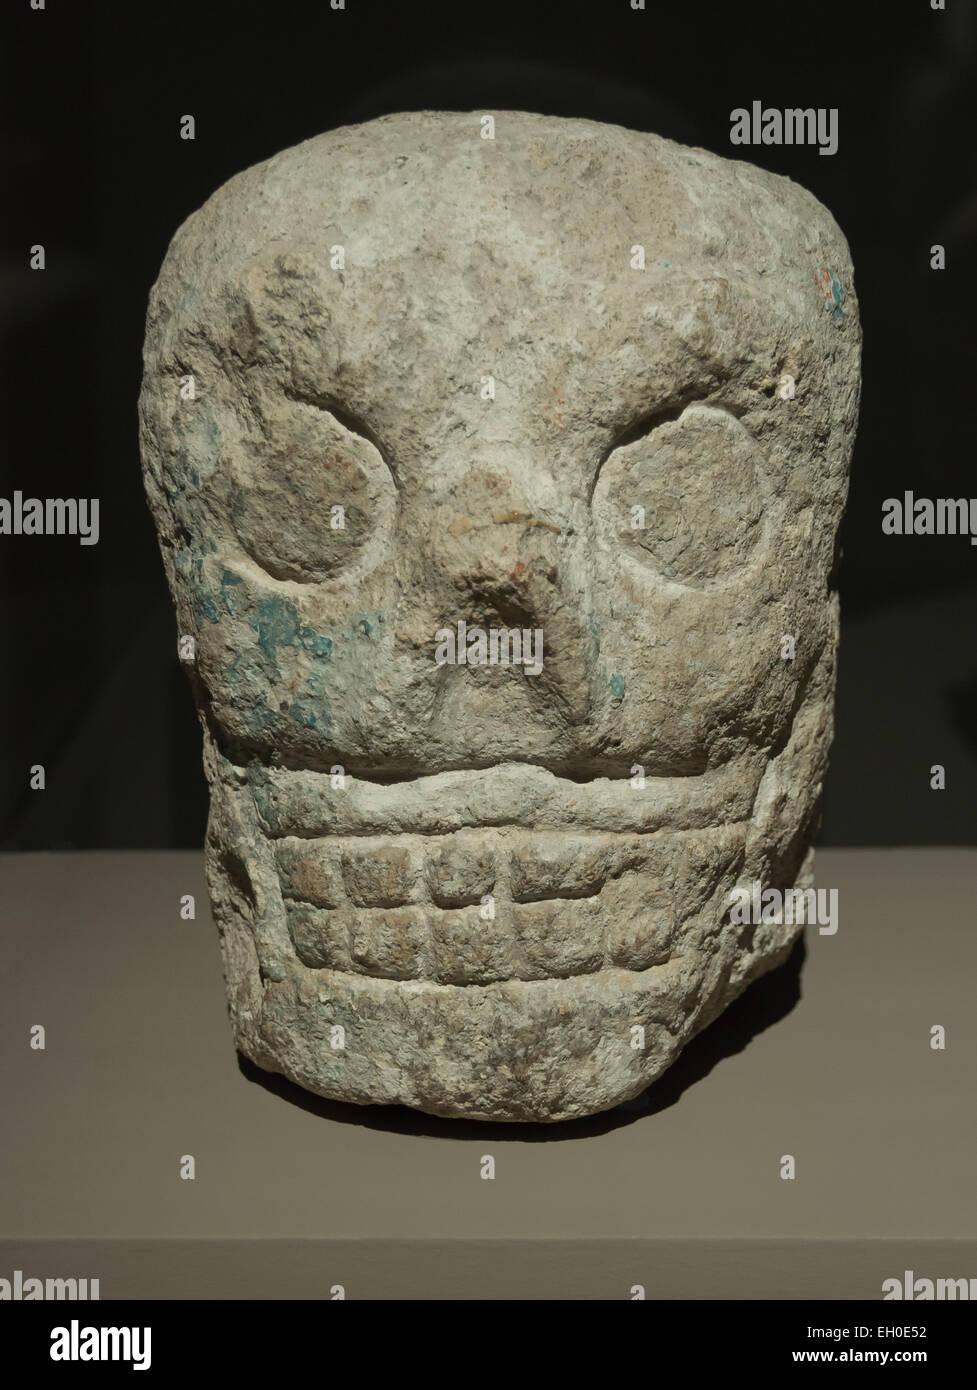 Decorative sculpture of a Maya skull, old post classic era (900 - 1250 CE), limestone. Yucatan, Mexico - Stock Image